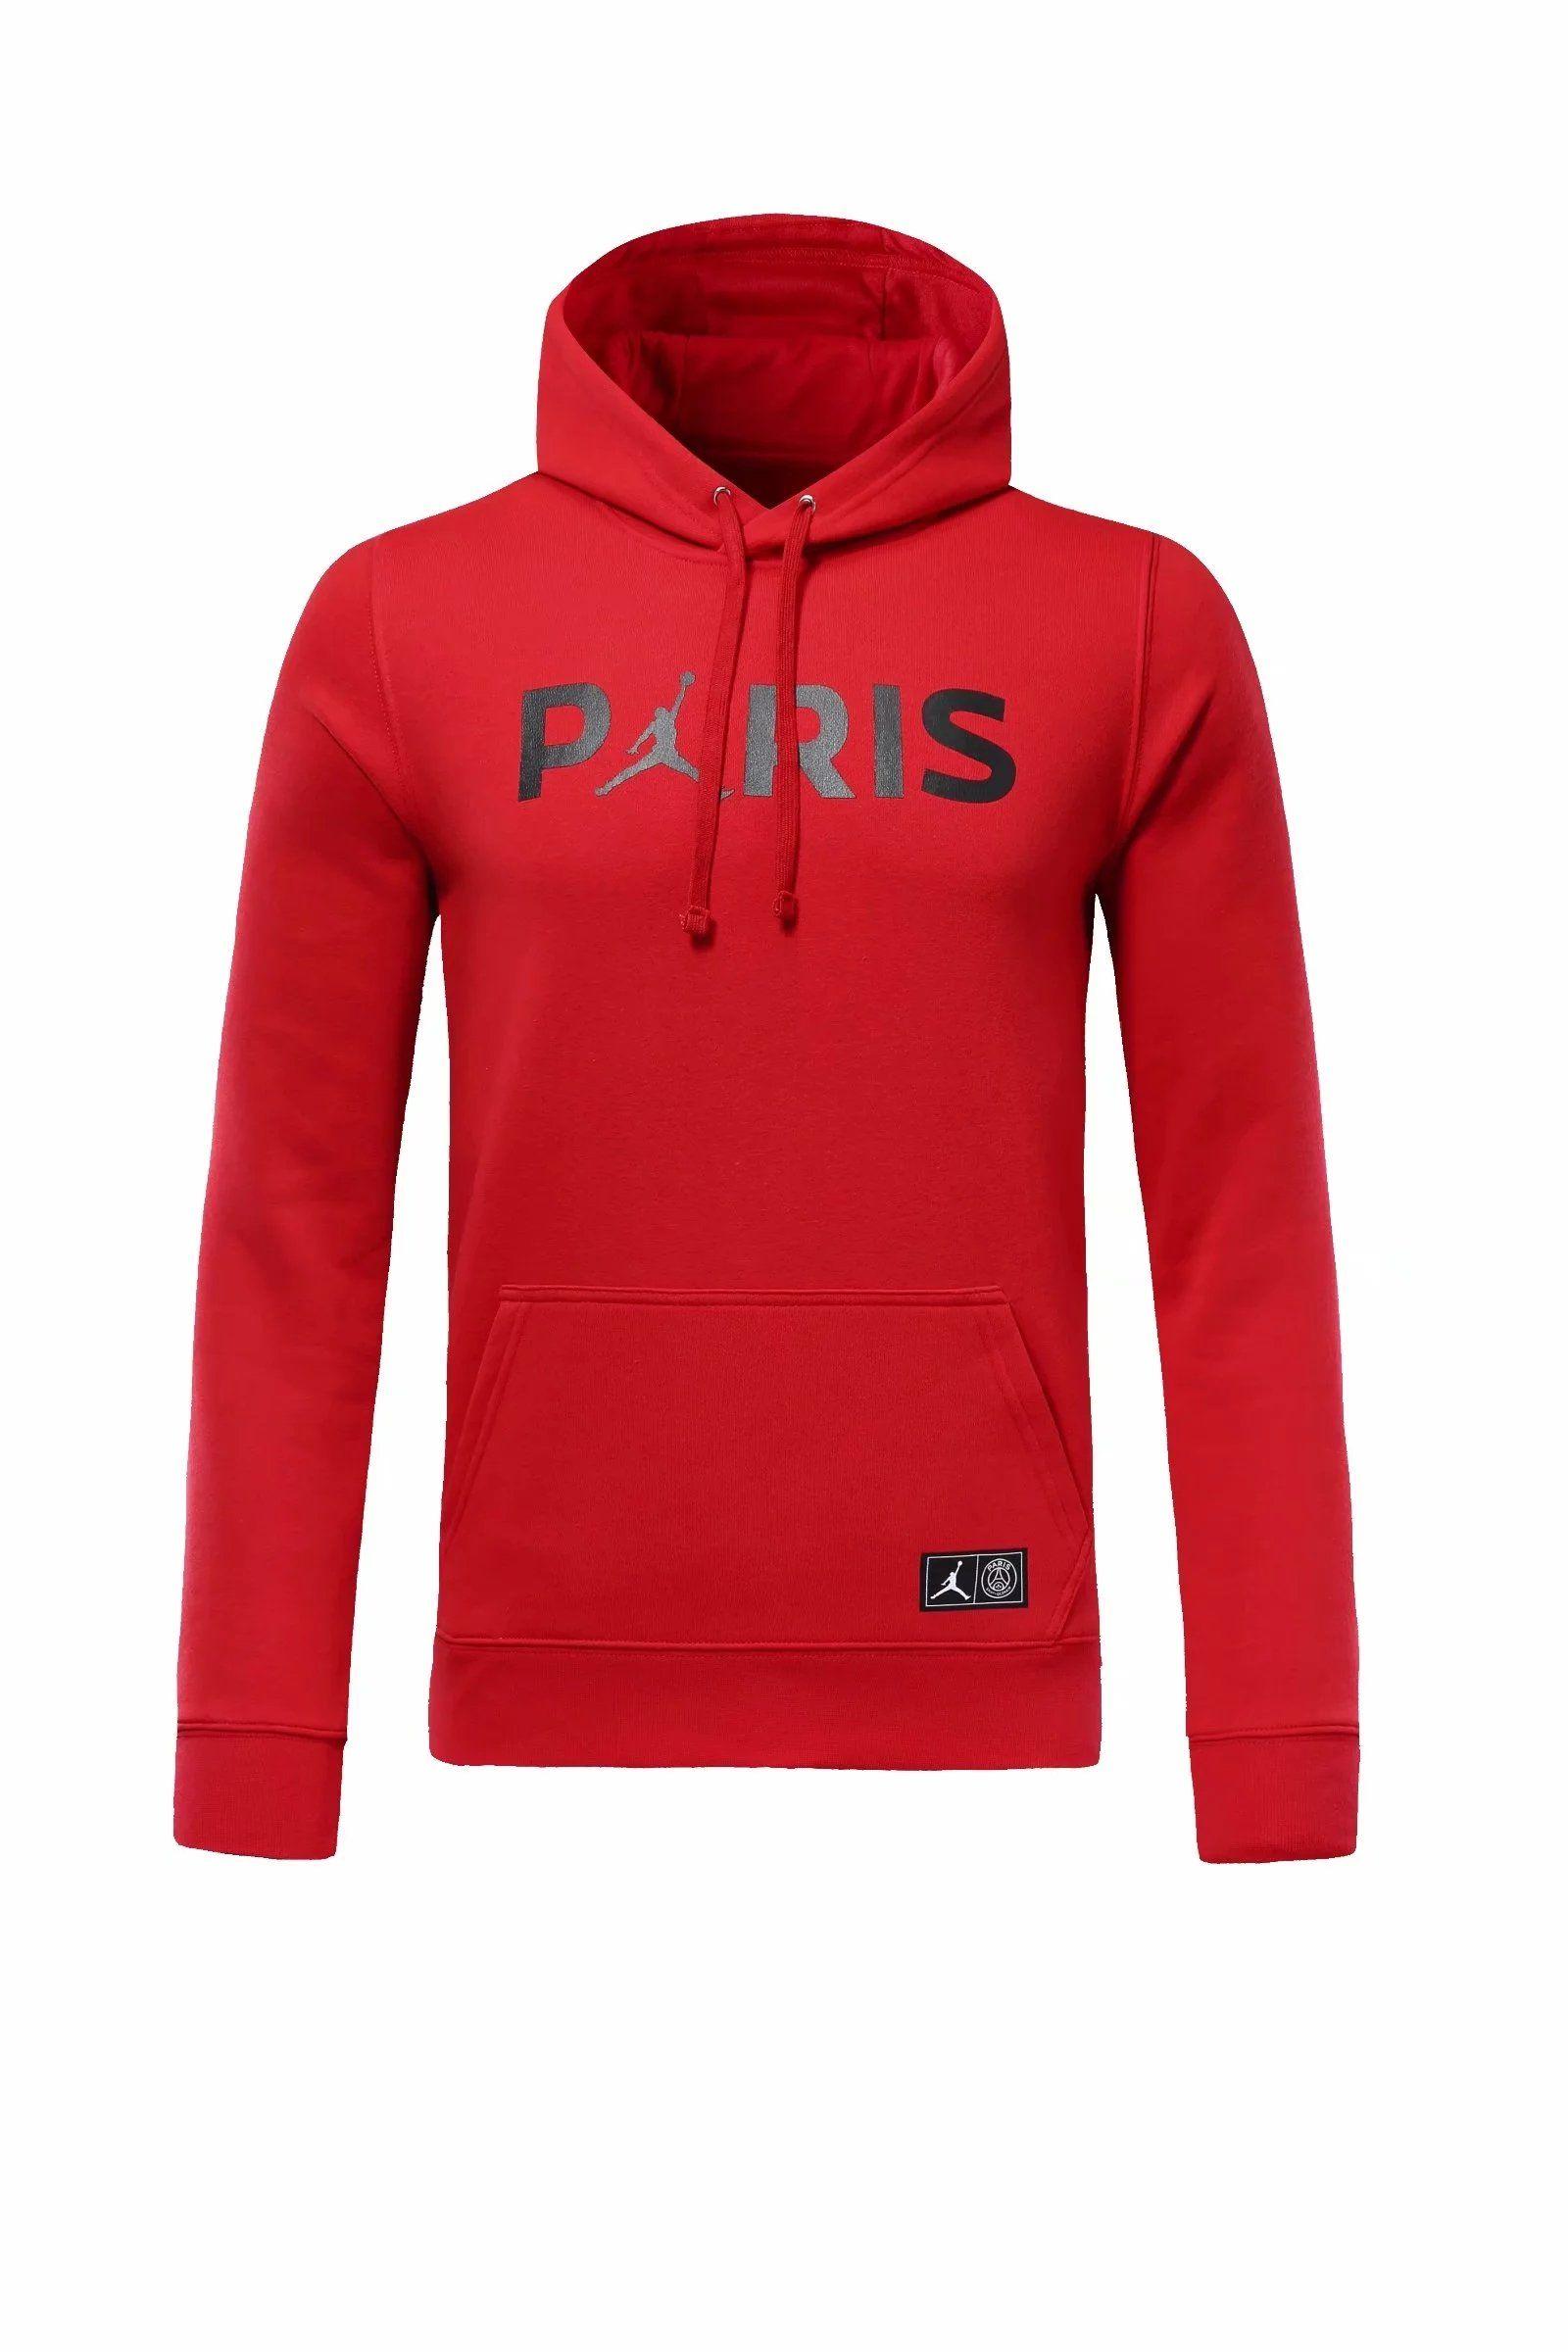 PSG 18 19 Jordan Red Sweatshirt   Products   Psg, Jordans, Jordan red 4bcee60c4f0a